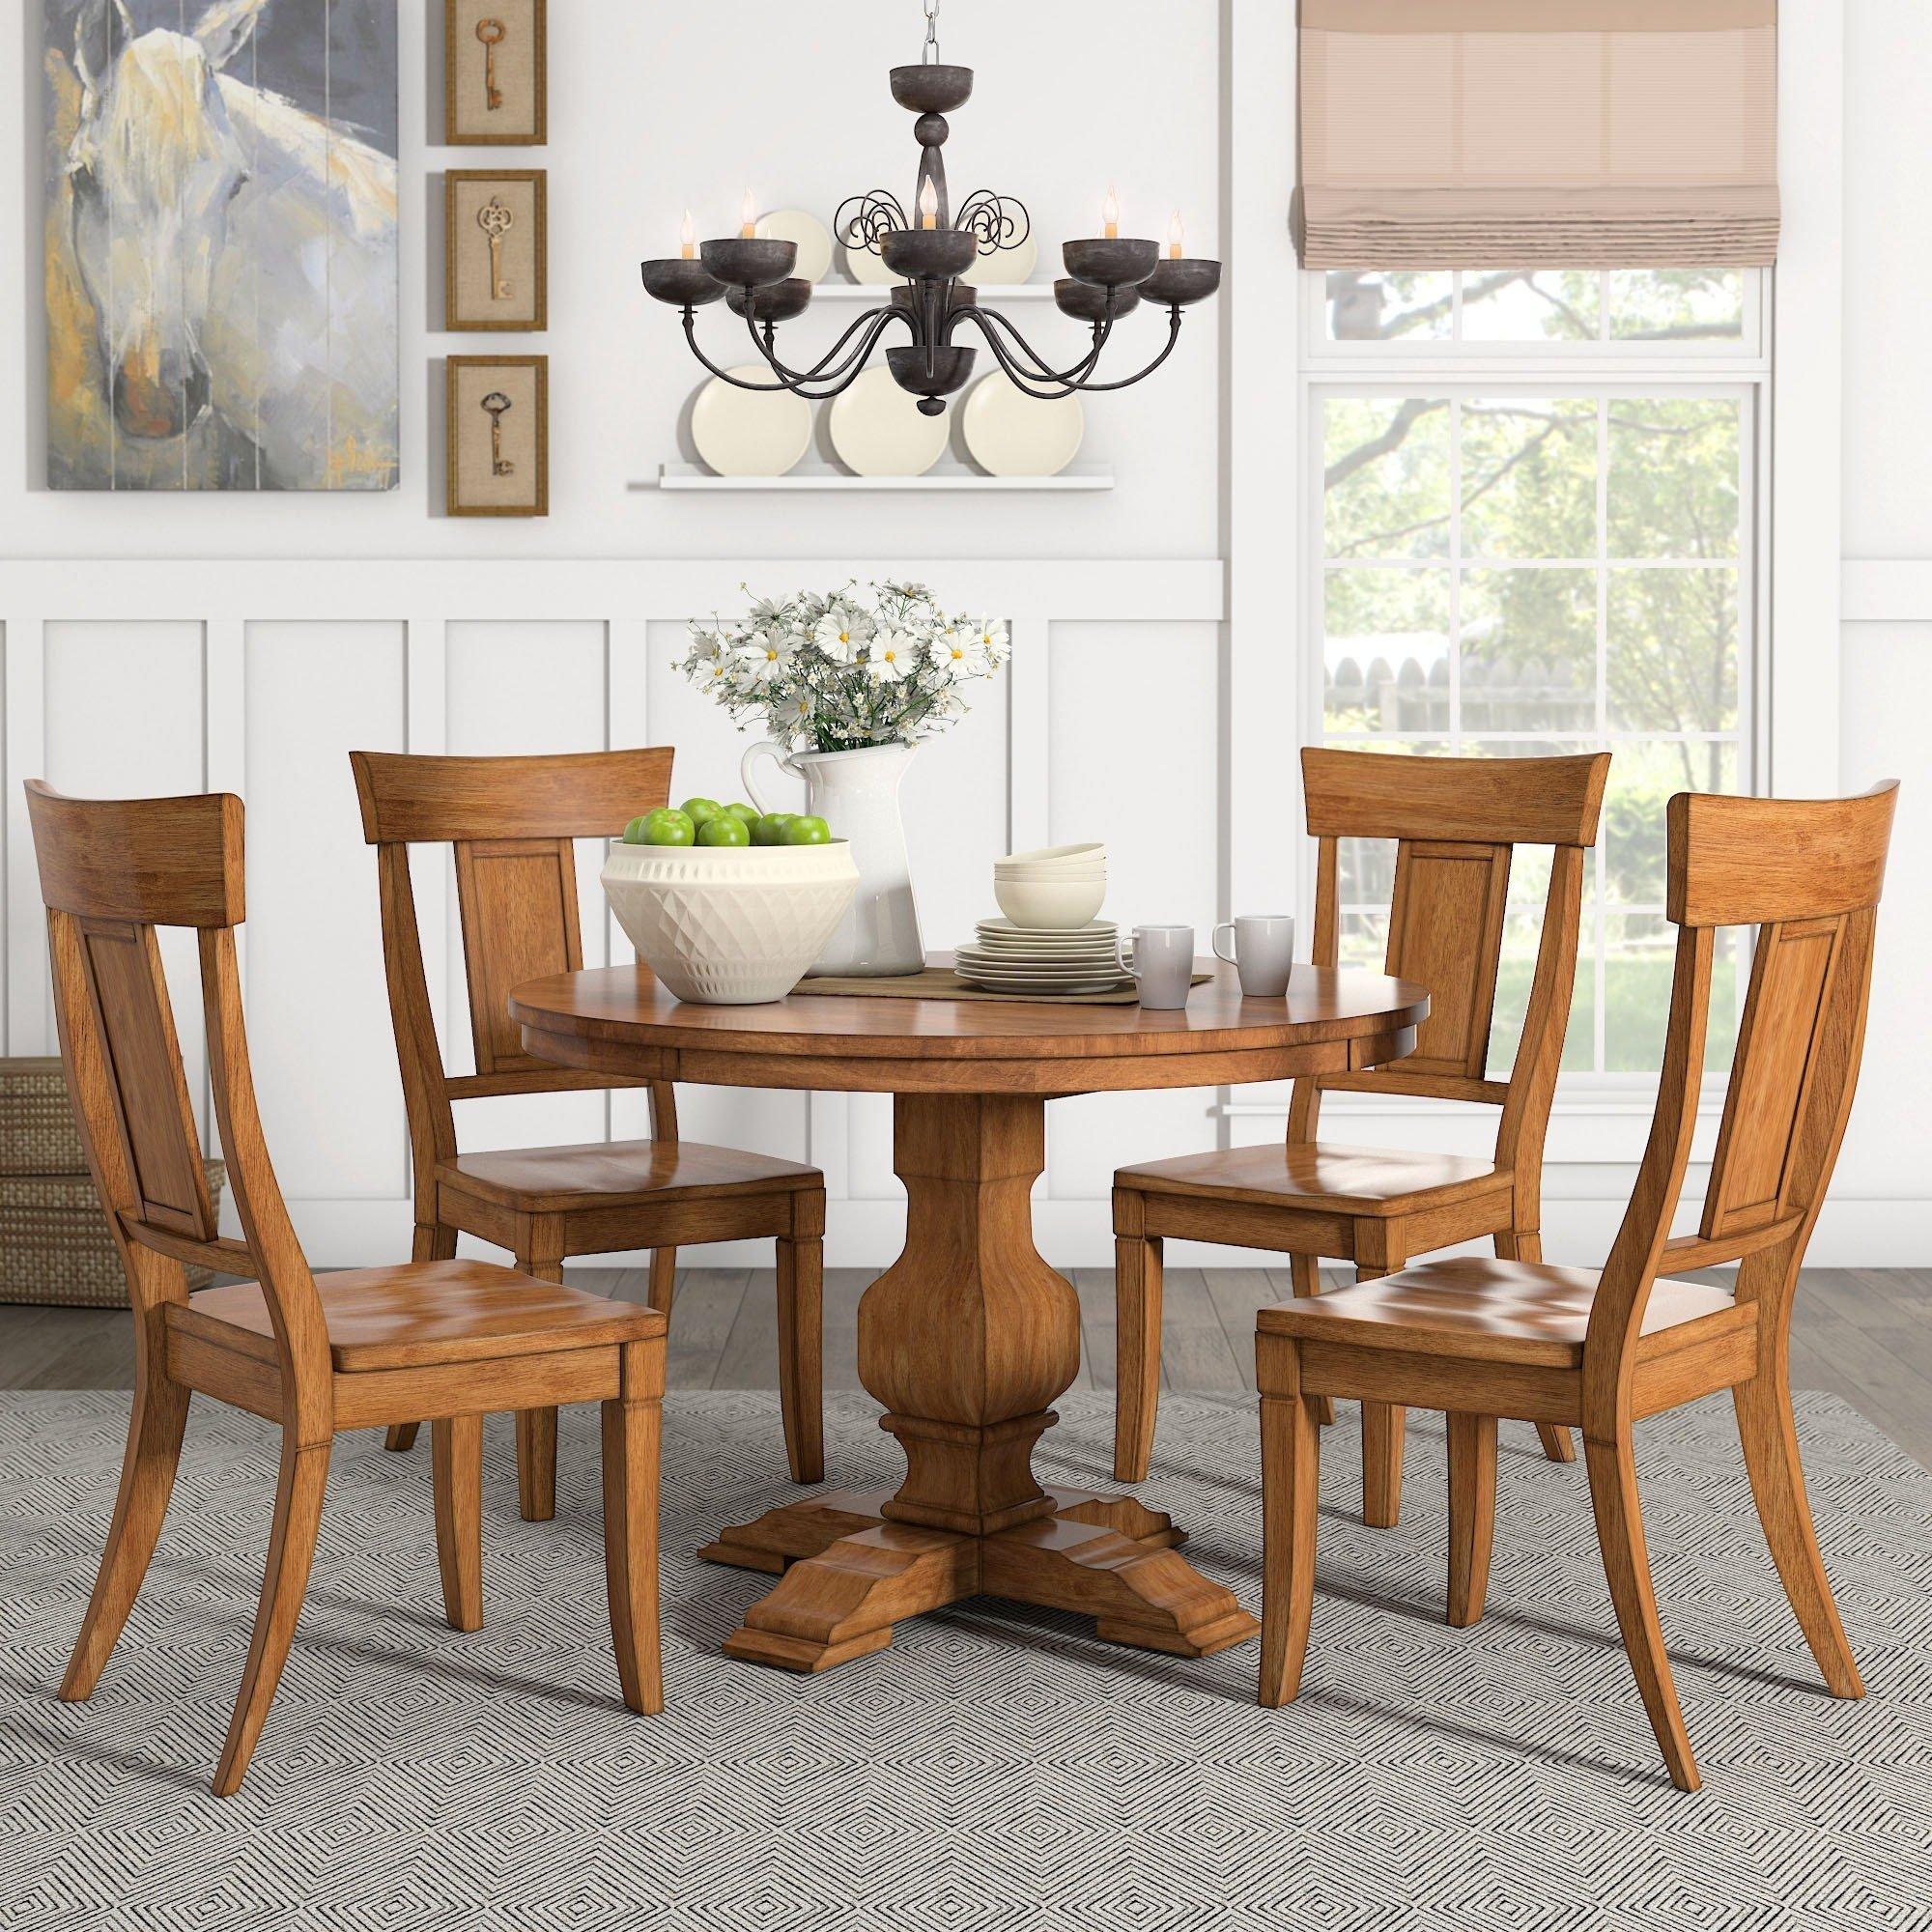 Teak Round Dining Table Set